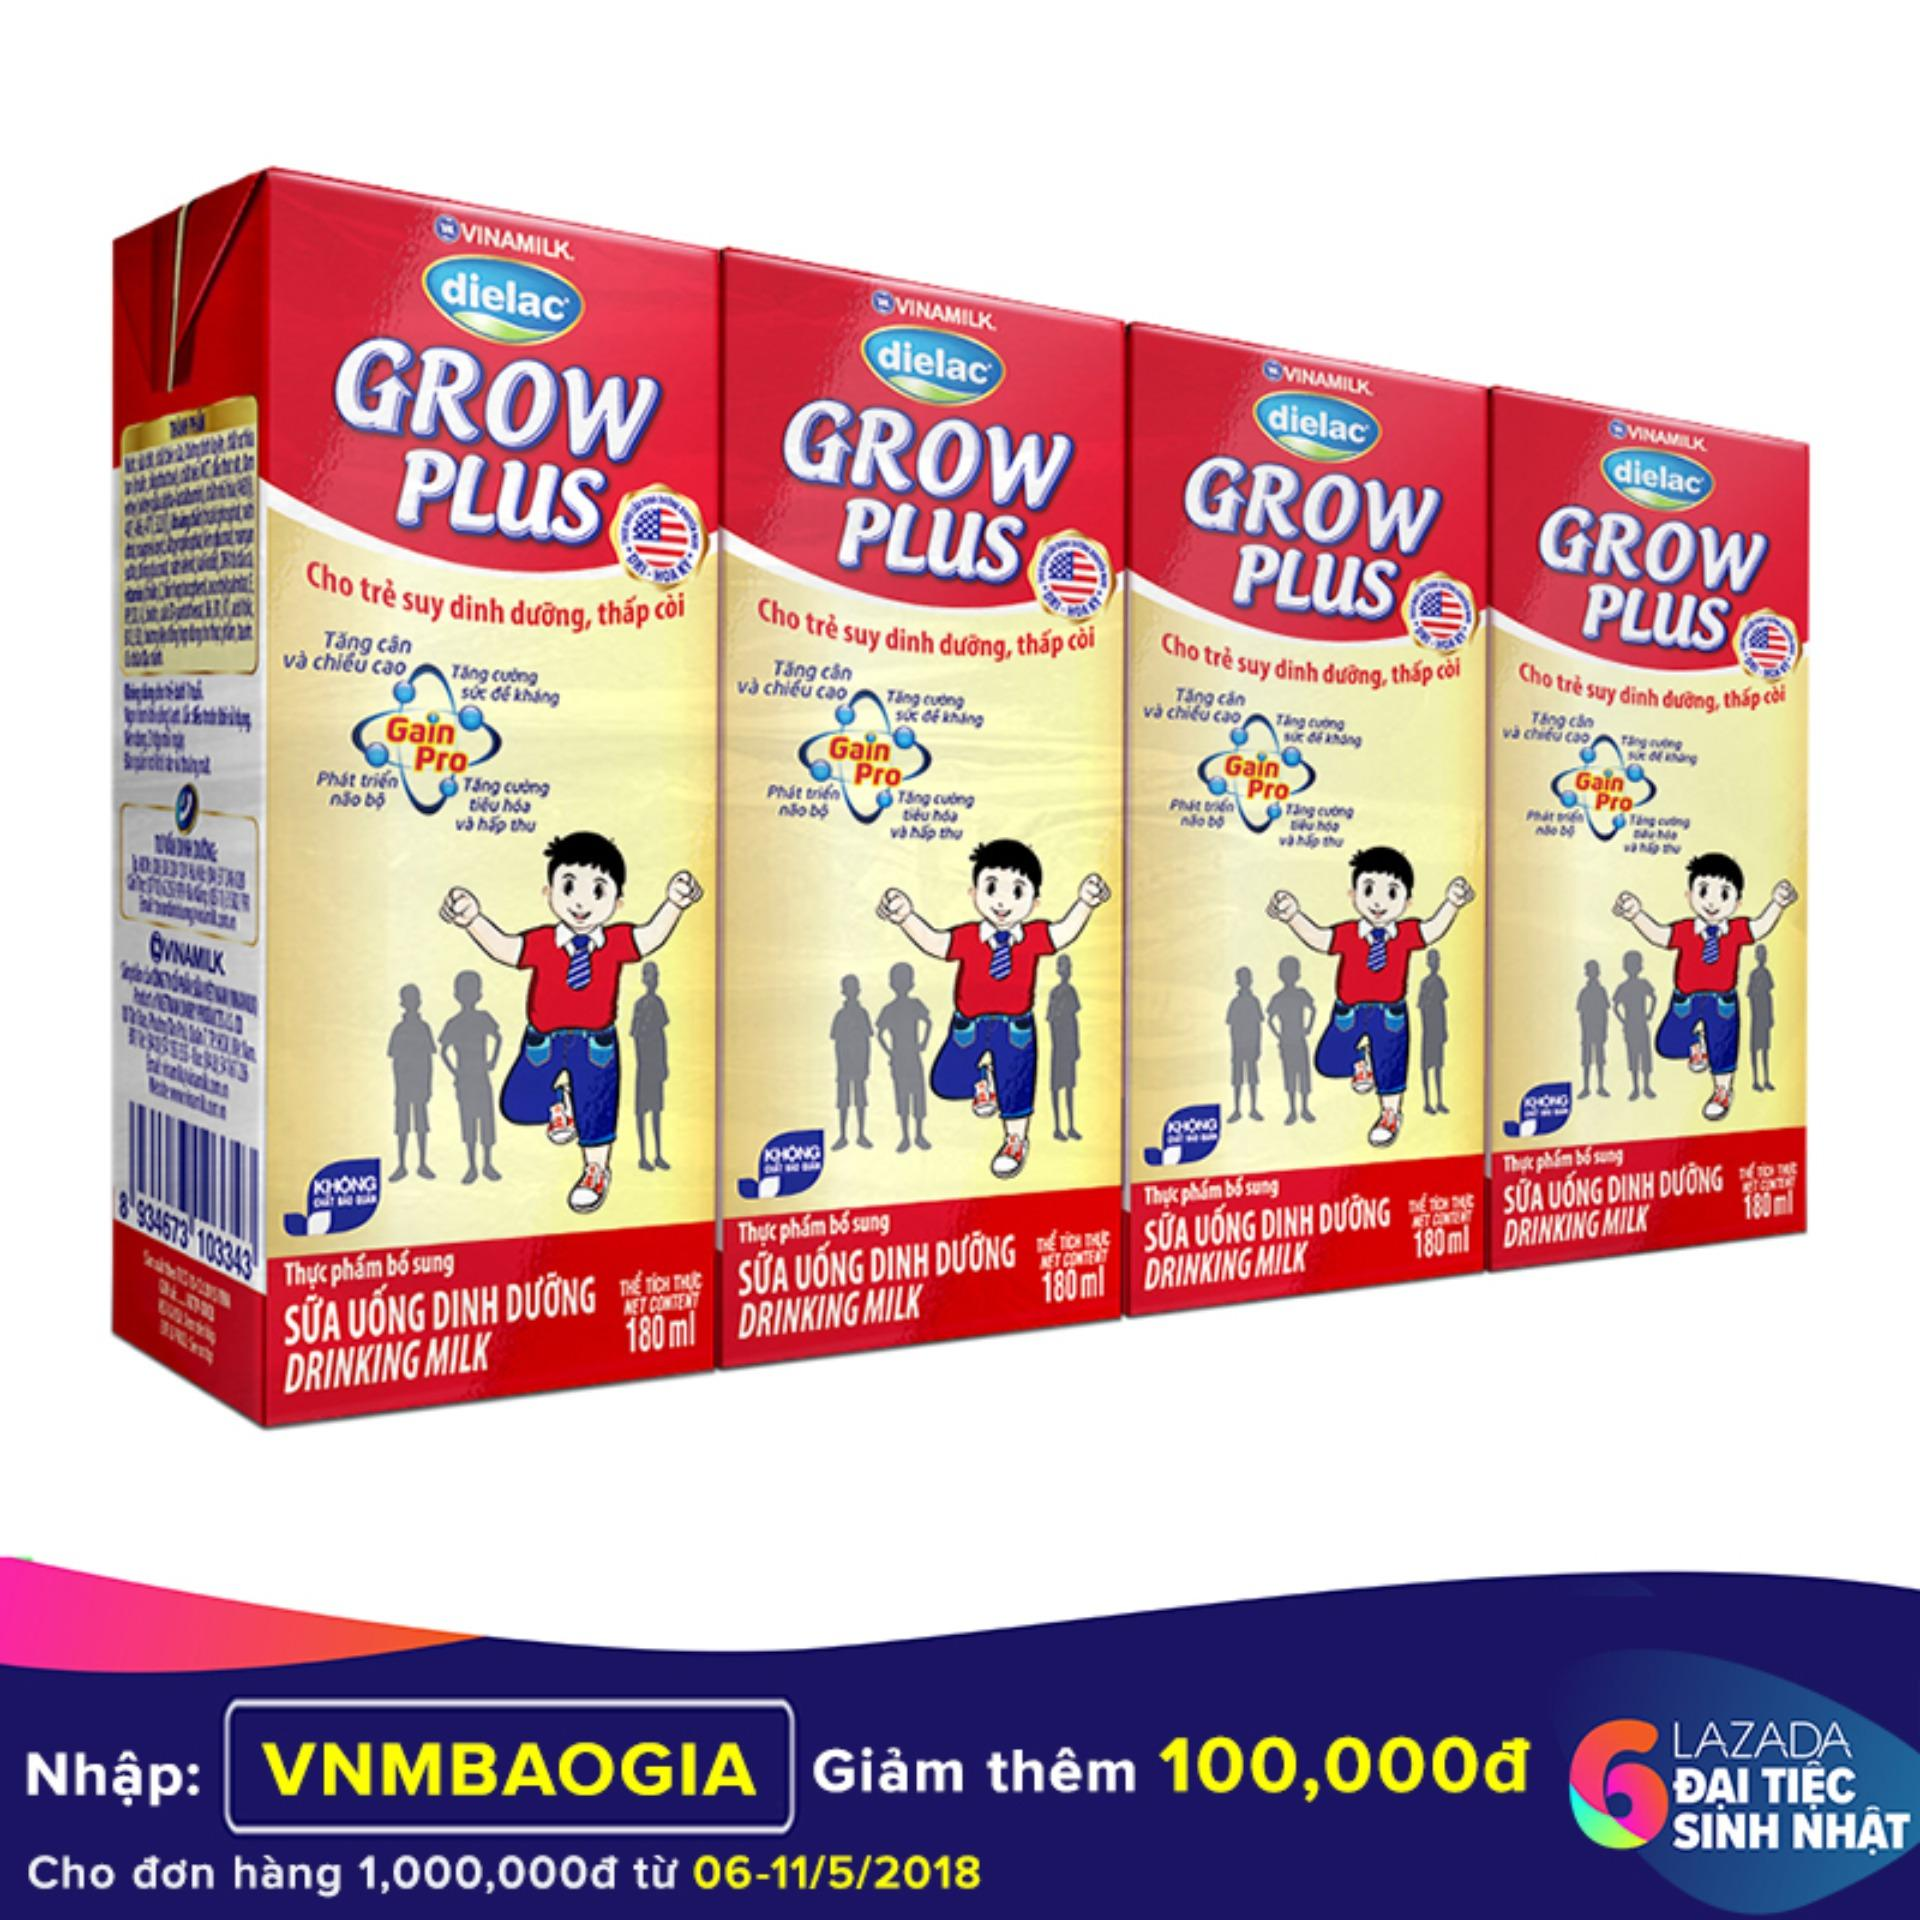 Mua Thung 48 Hộp Sữa Bột Pha Sẵn Vinamilk Dielac Grow Plus 180Ml Trực Tuyến Hồ Chí Minh